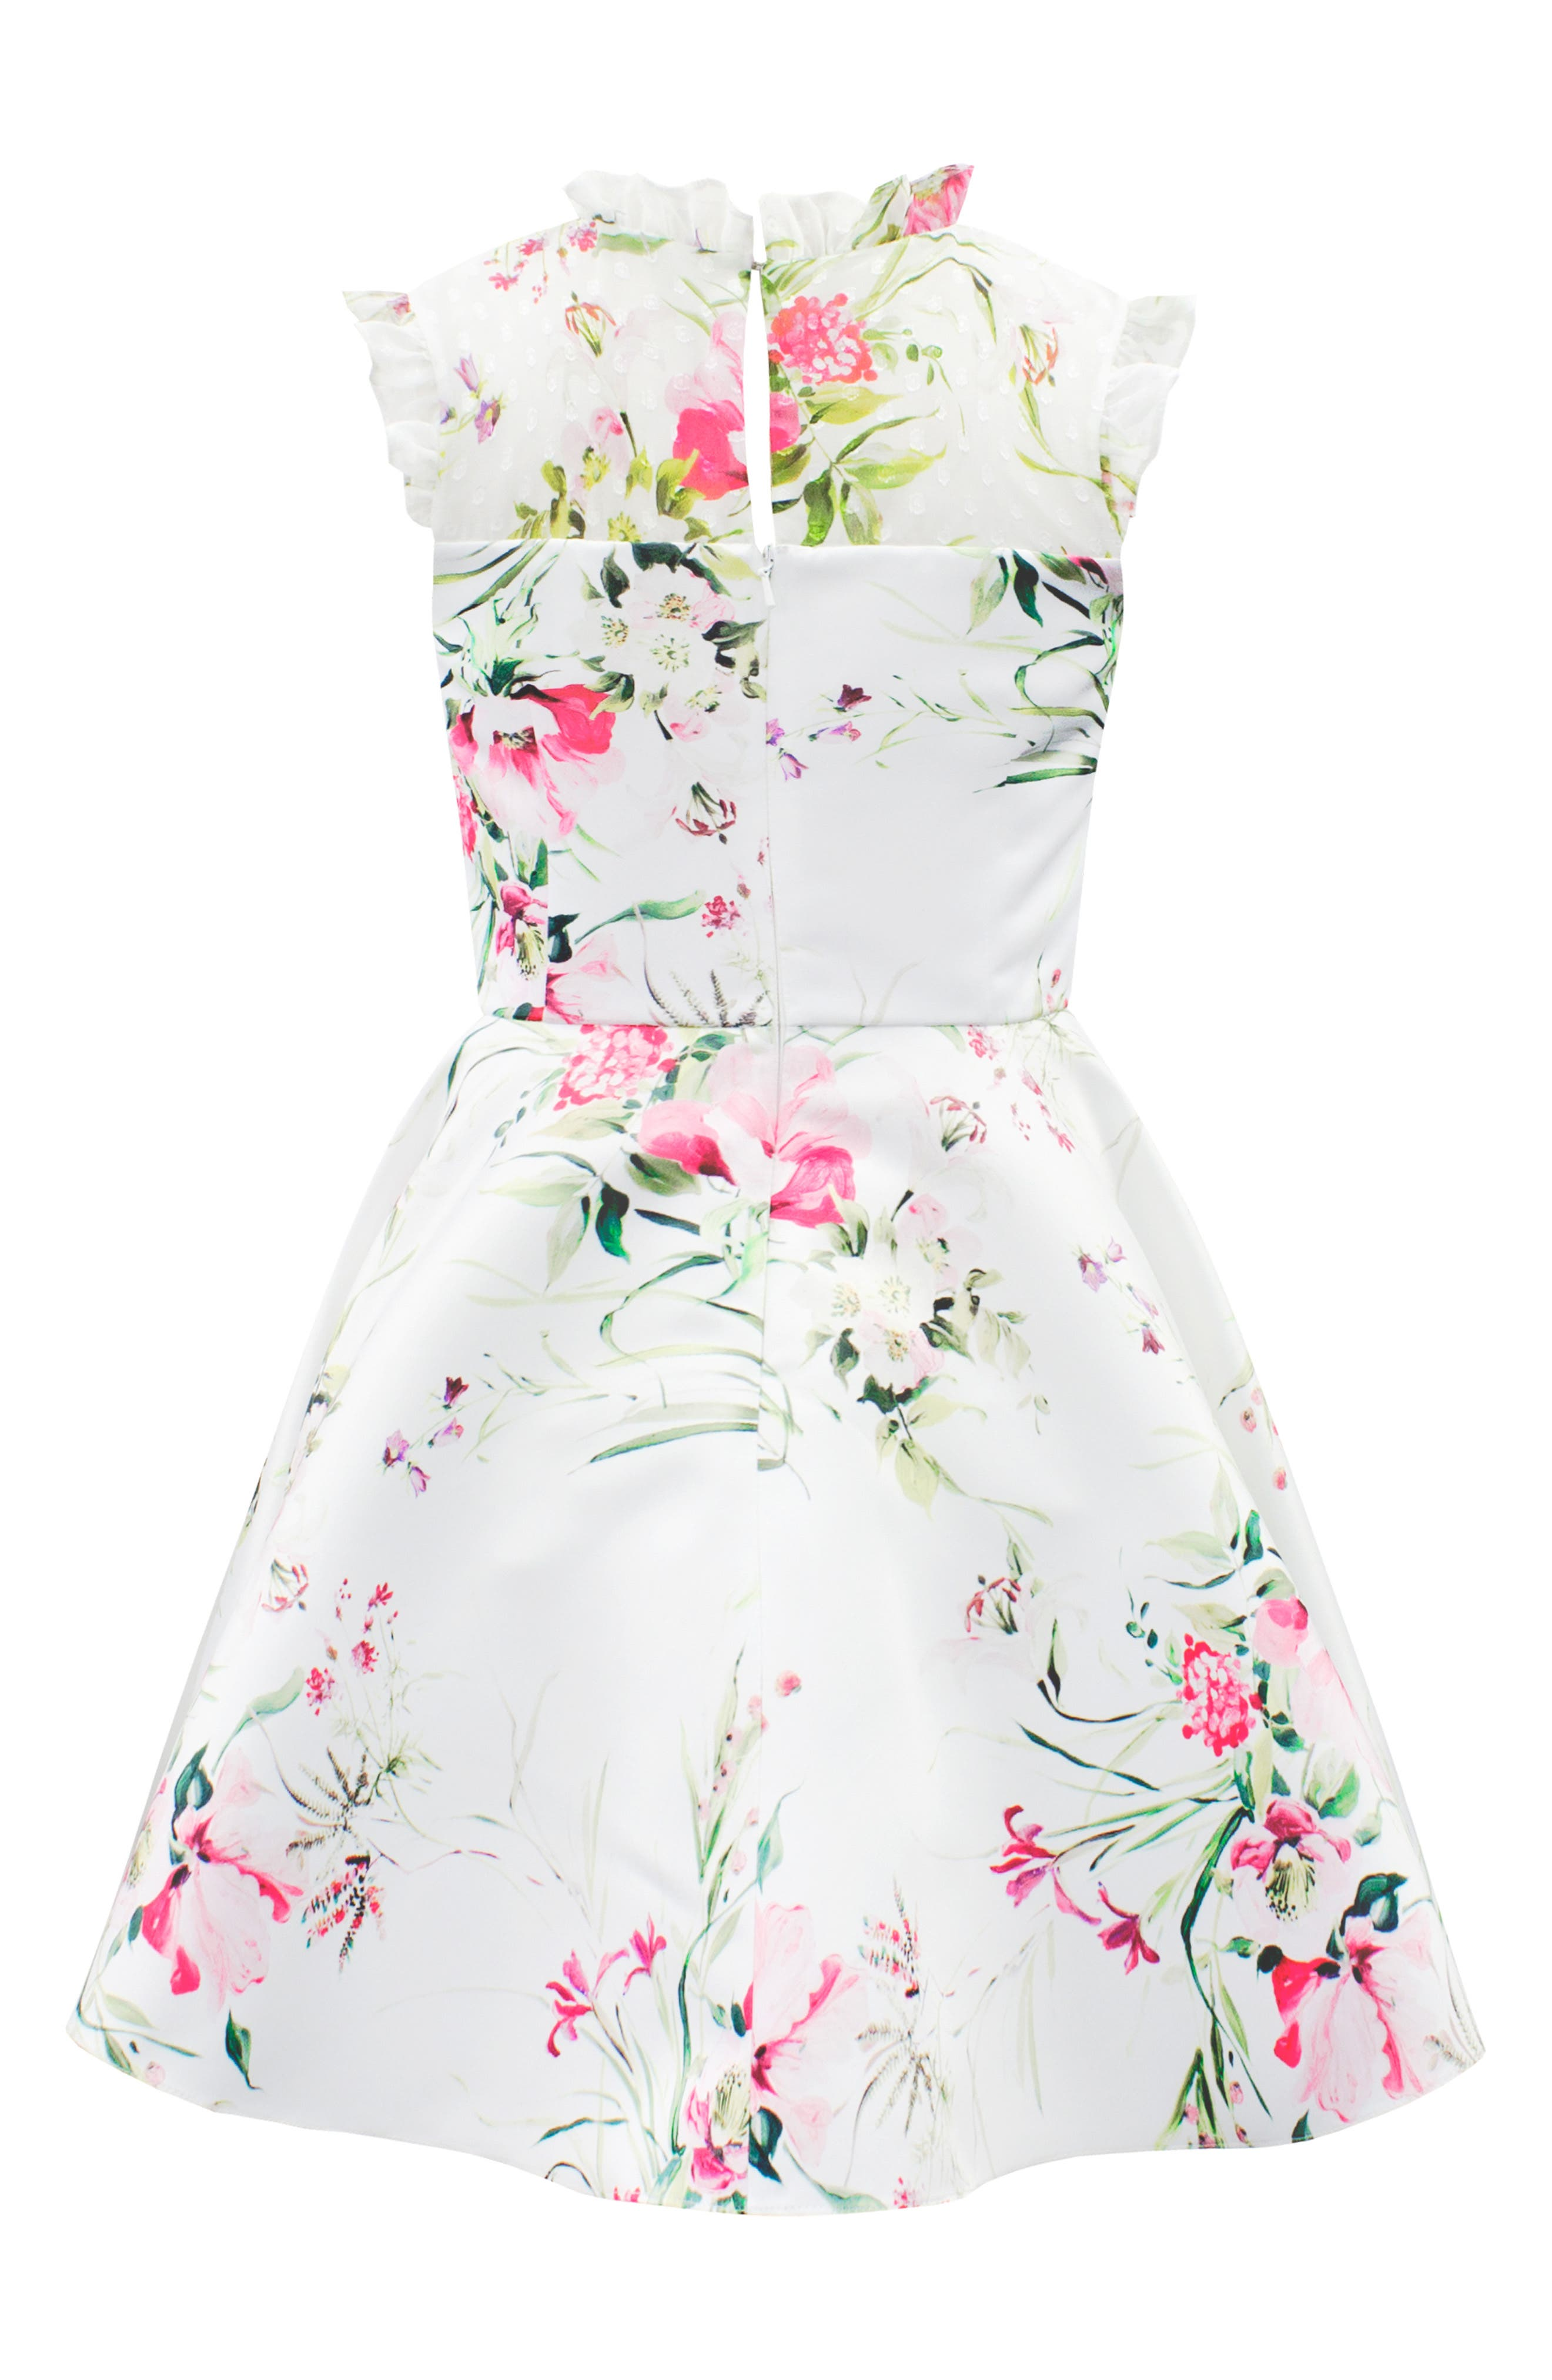 Floral Print Satin & Swiss Dot Party Dress,                             Alternate thumbnail 2, color,                             IVORY/ PINK